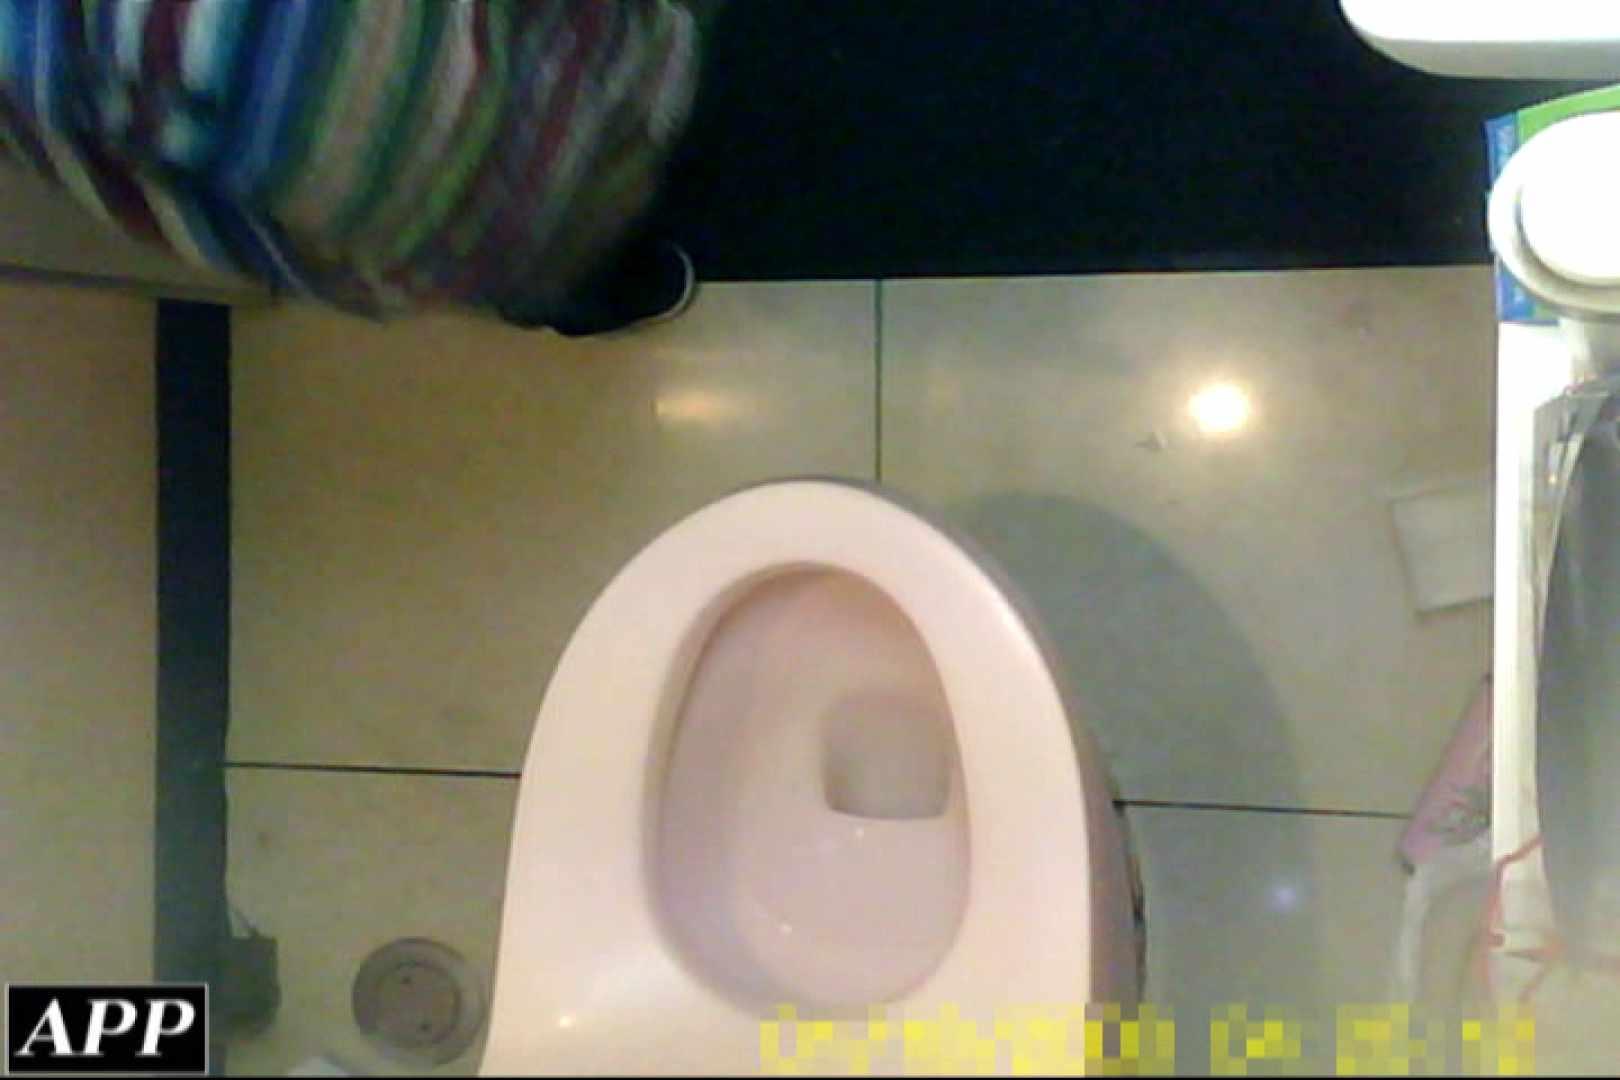 3視点洗面所 vol.128 肛門 | マンコ特集  93連発 63